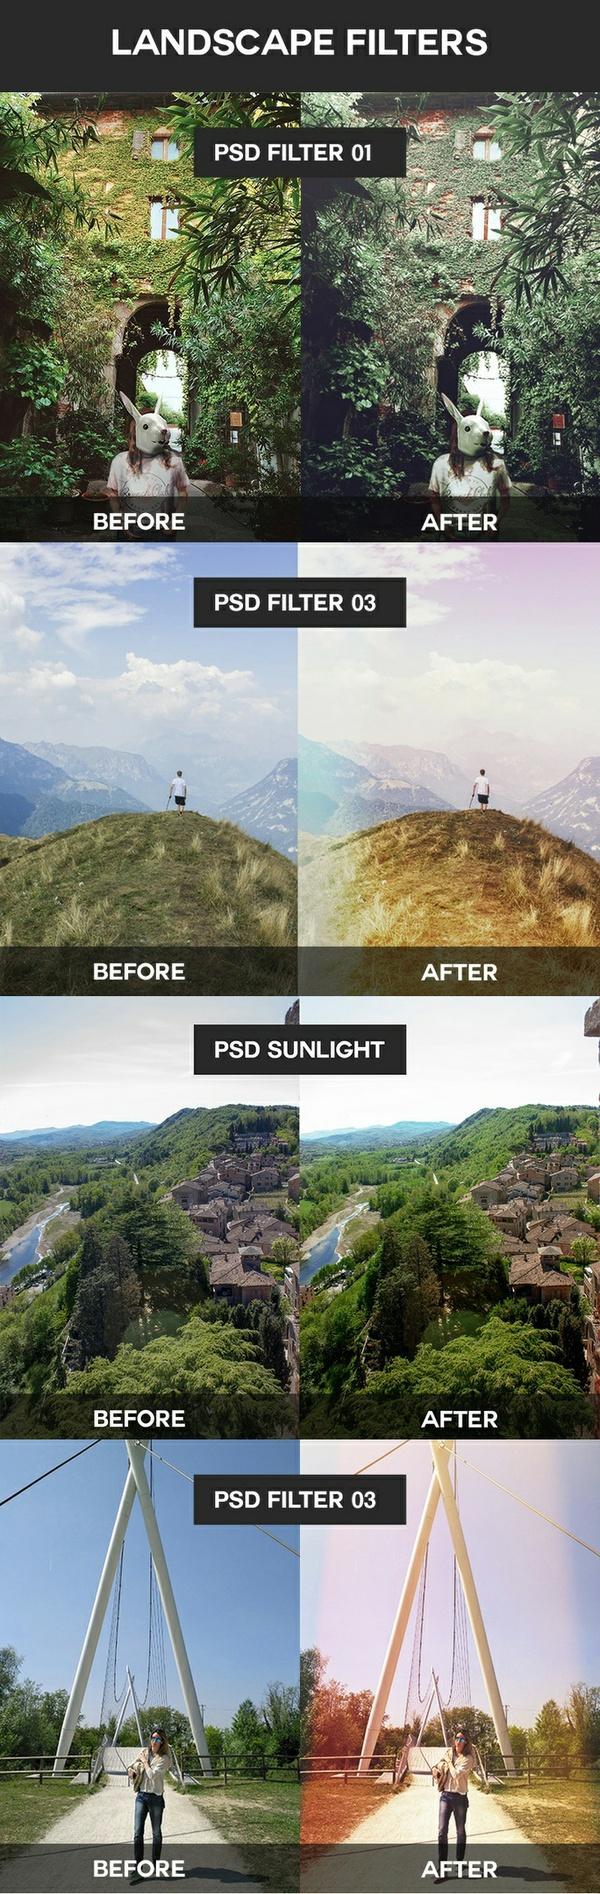 Landscape Filters PSD Coloring Sunlight